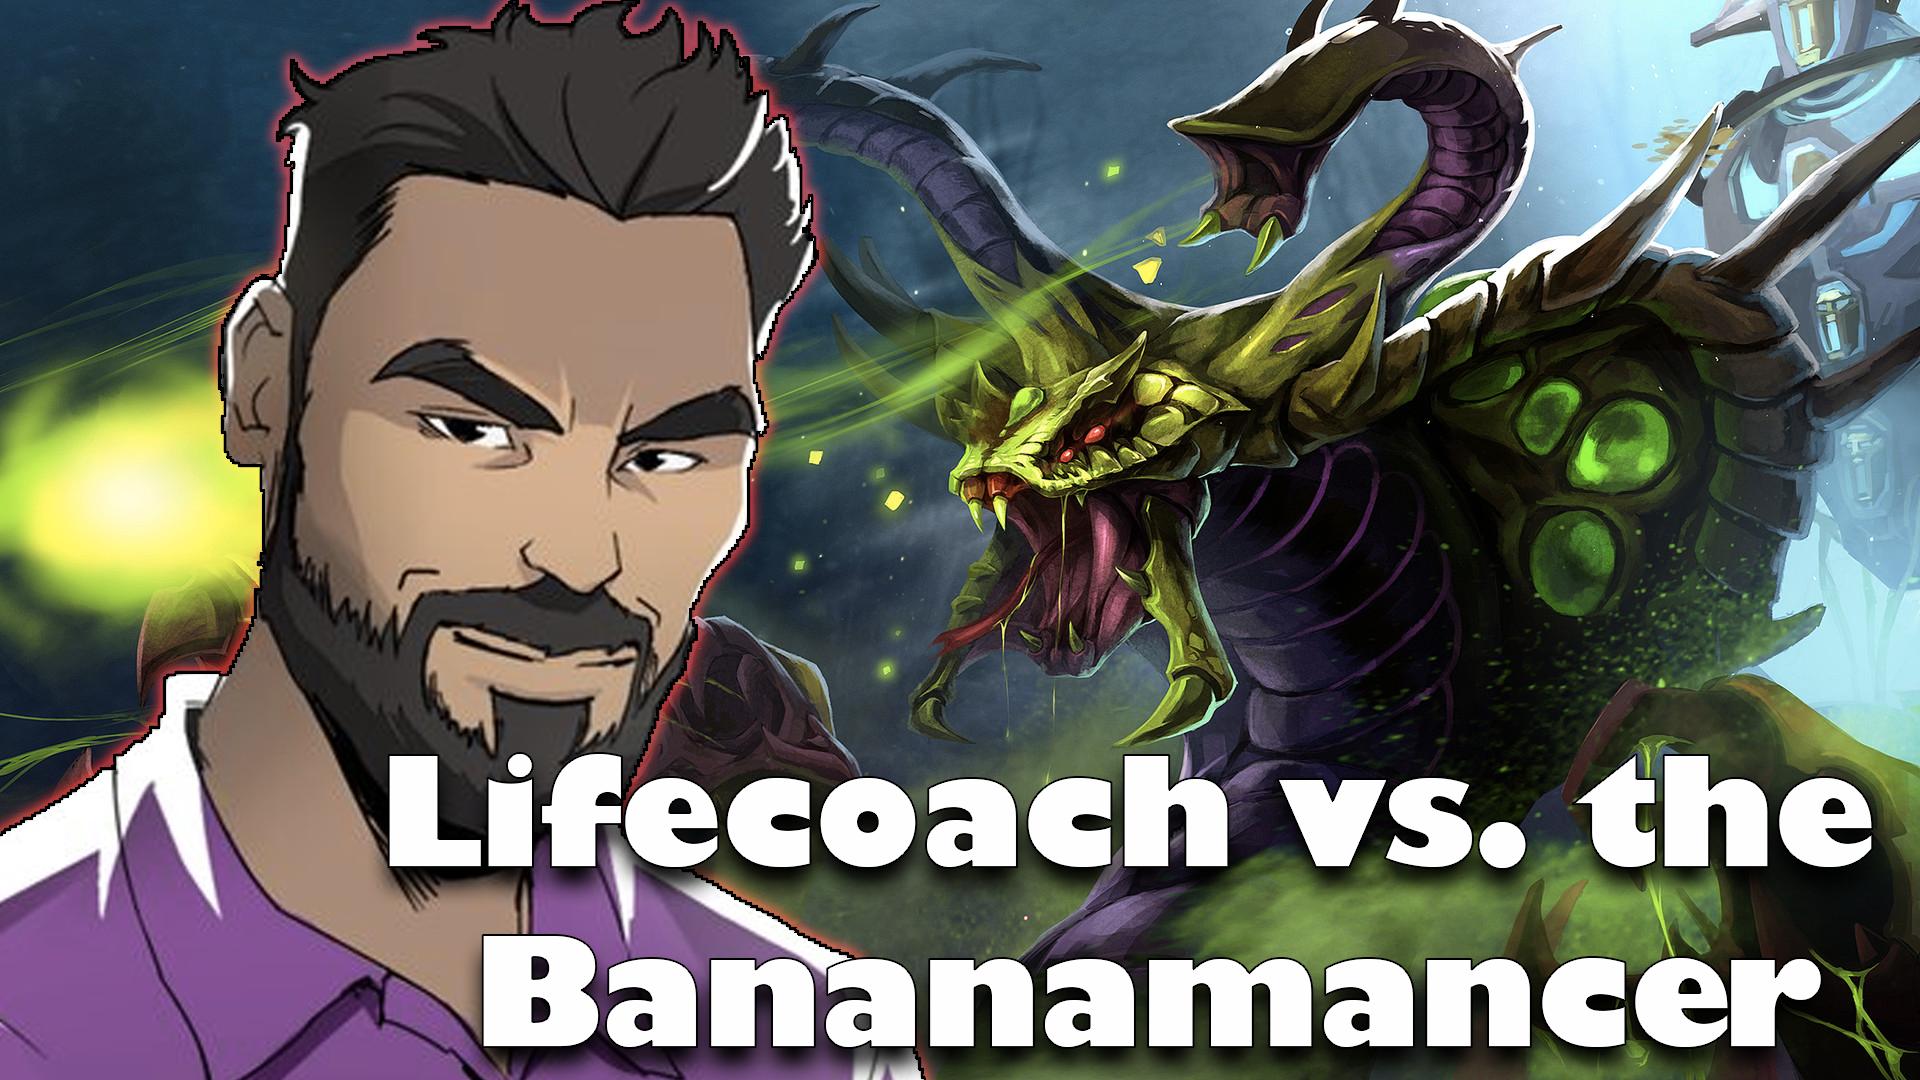 Lifecoach versus the Bananamancer - Daily game analysis begins! Starting with Lifecoach versus FeelsGoodman.Video - Neon - November 12, 2018